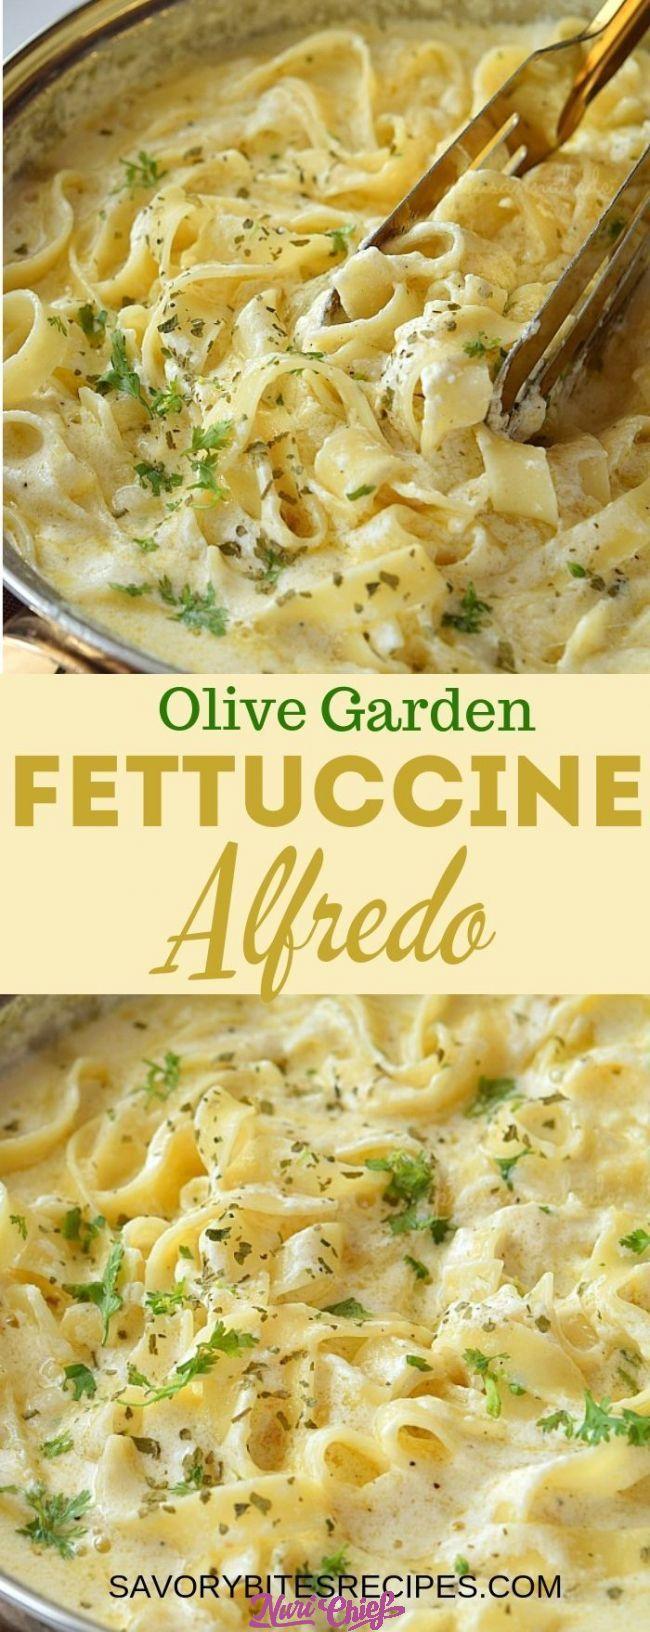 Fettuccine Alfredo (Olive Garden Copycat) in 2020 Pasta